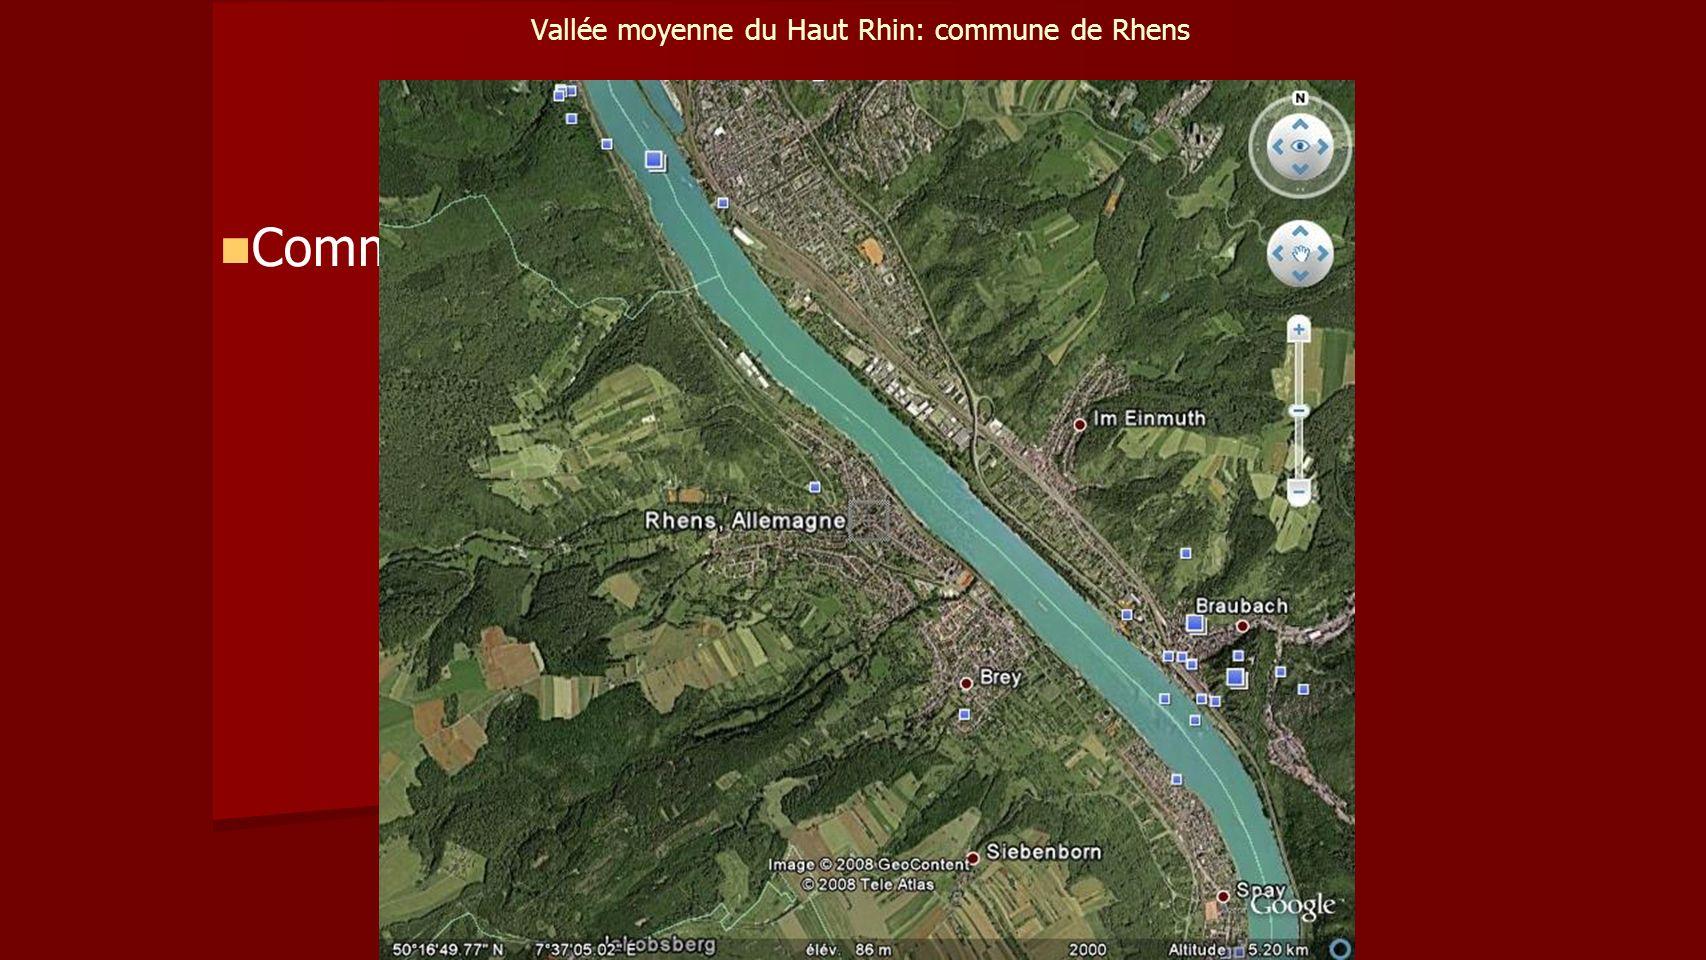 Vallée moyenne du Haut Rhin: commune de Rhens Commune Rhens